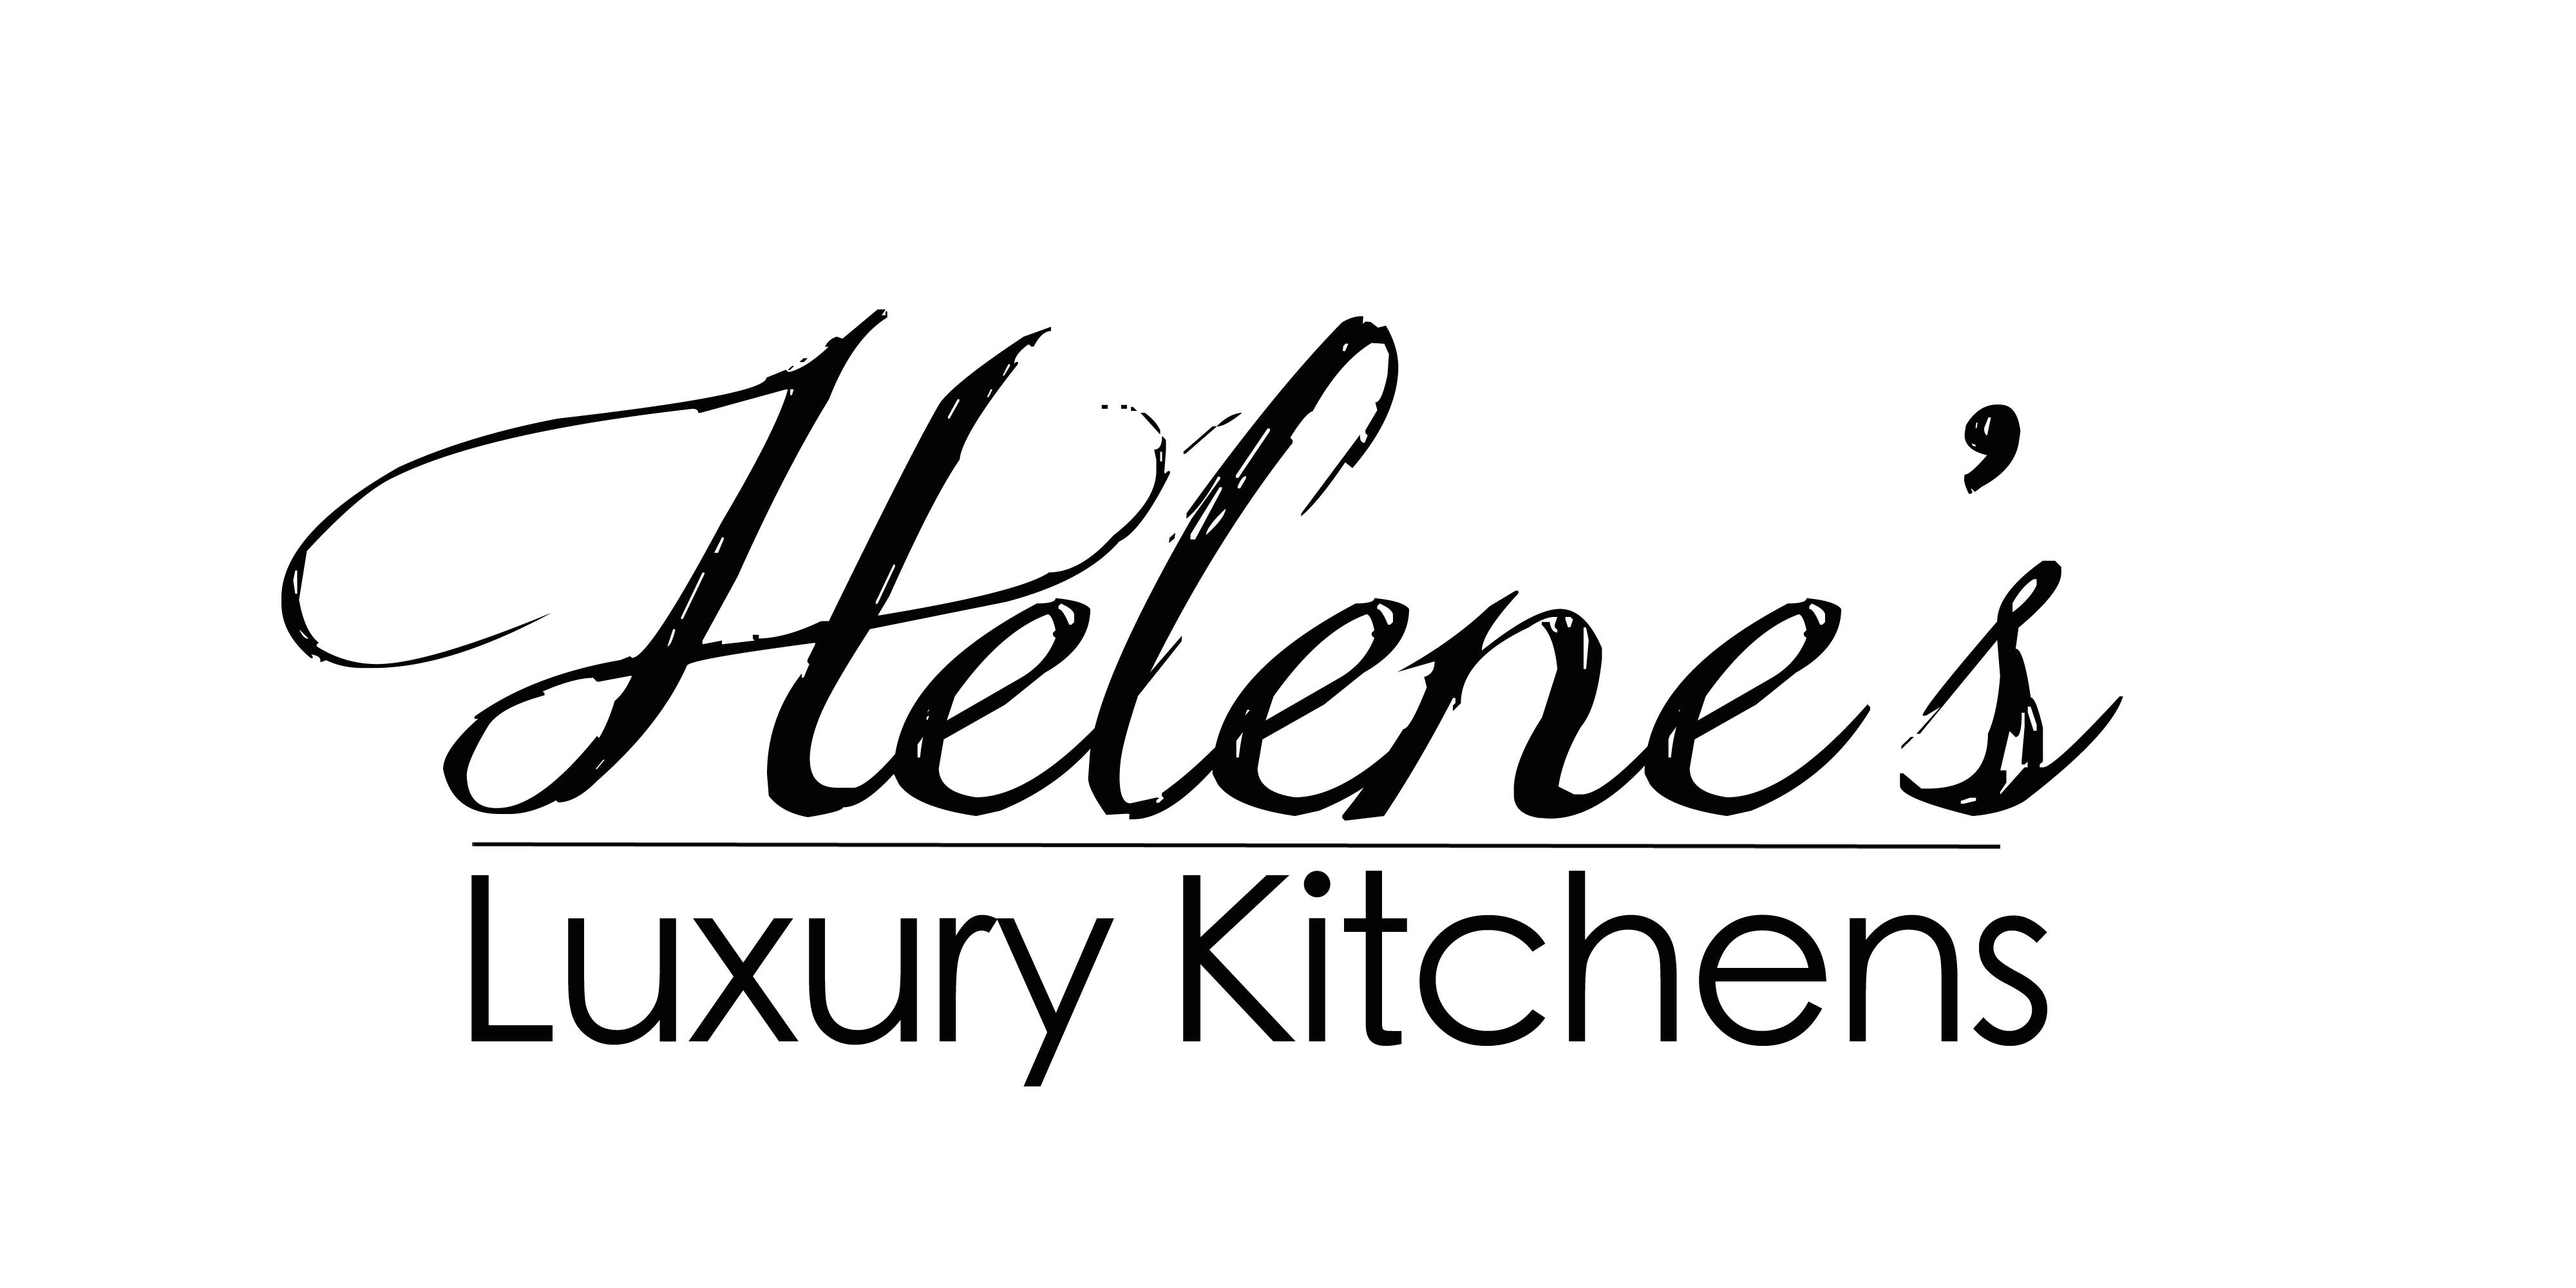 Tour of Homes - Helen's Luxury Kitchens logo